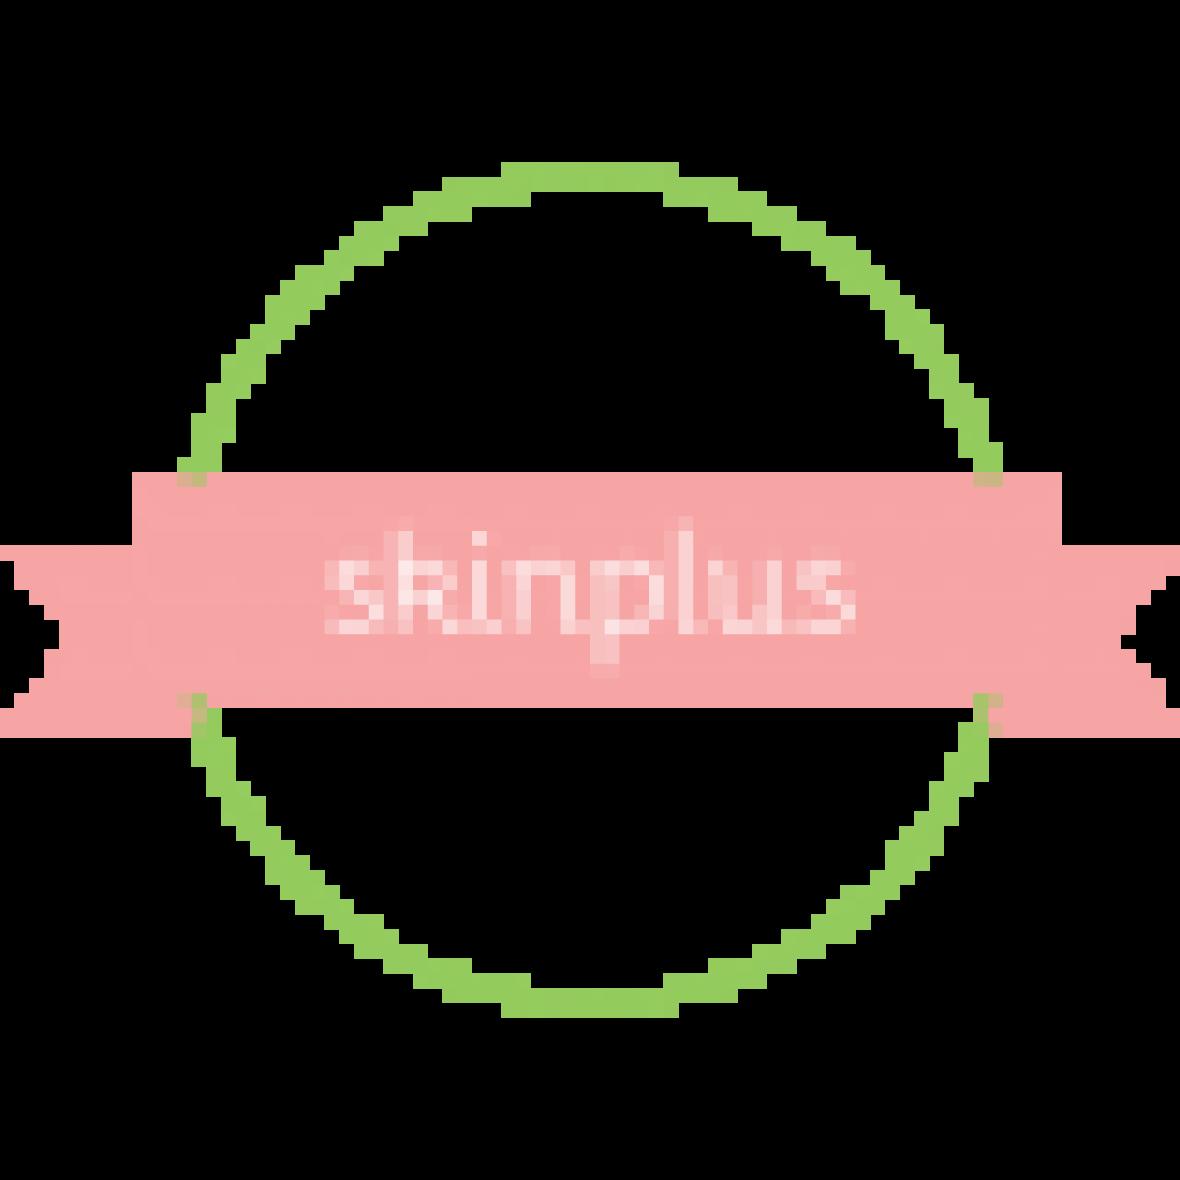 skinplusng